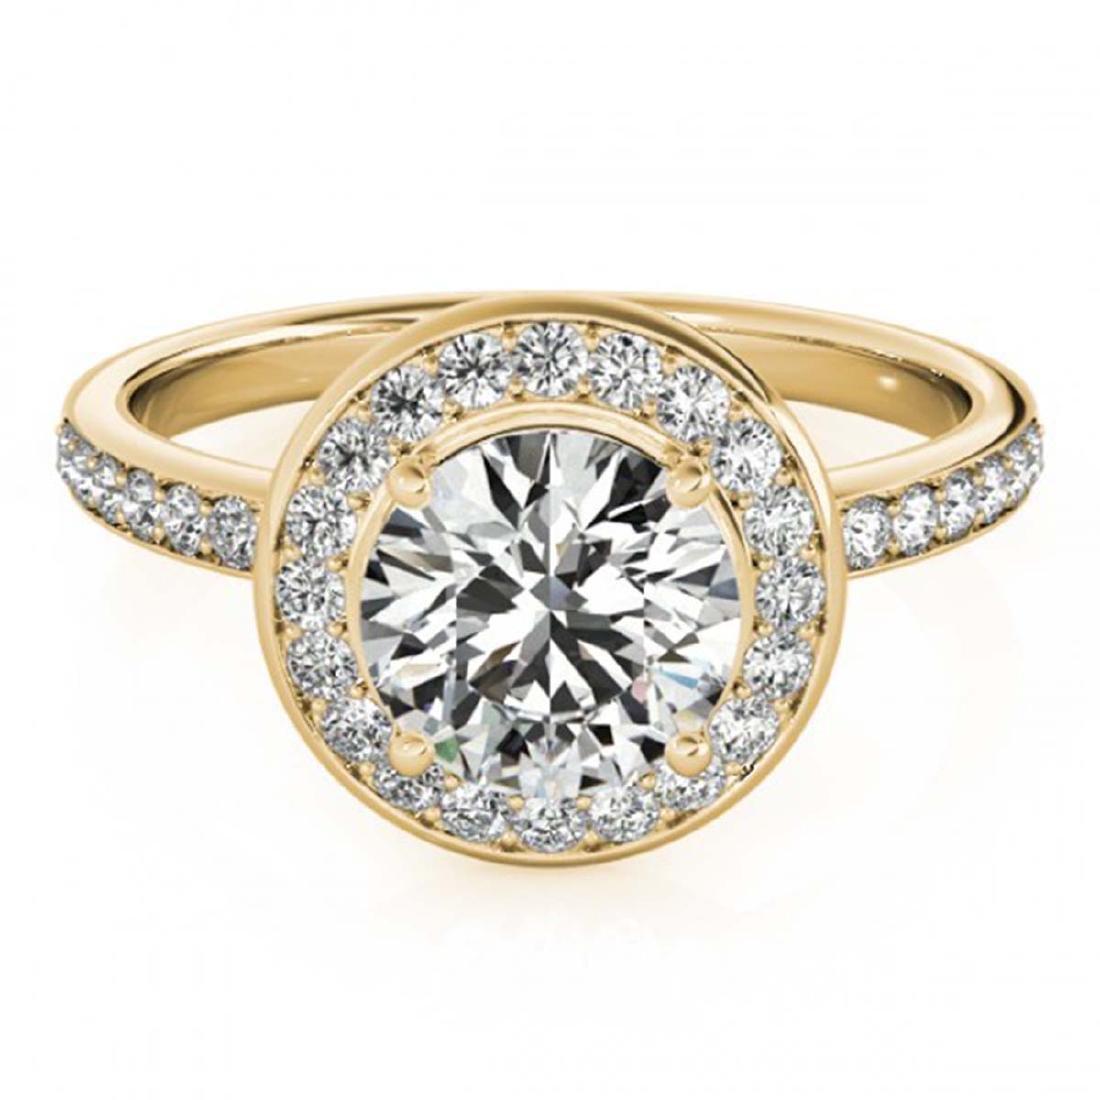 1.08 ctw VS/SI Diamond Halo Ring 18K Yellow Gold -